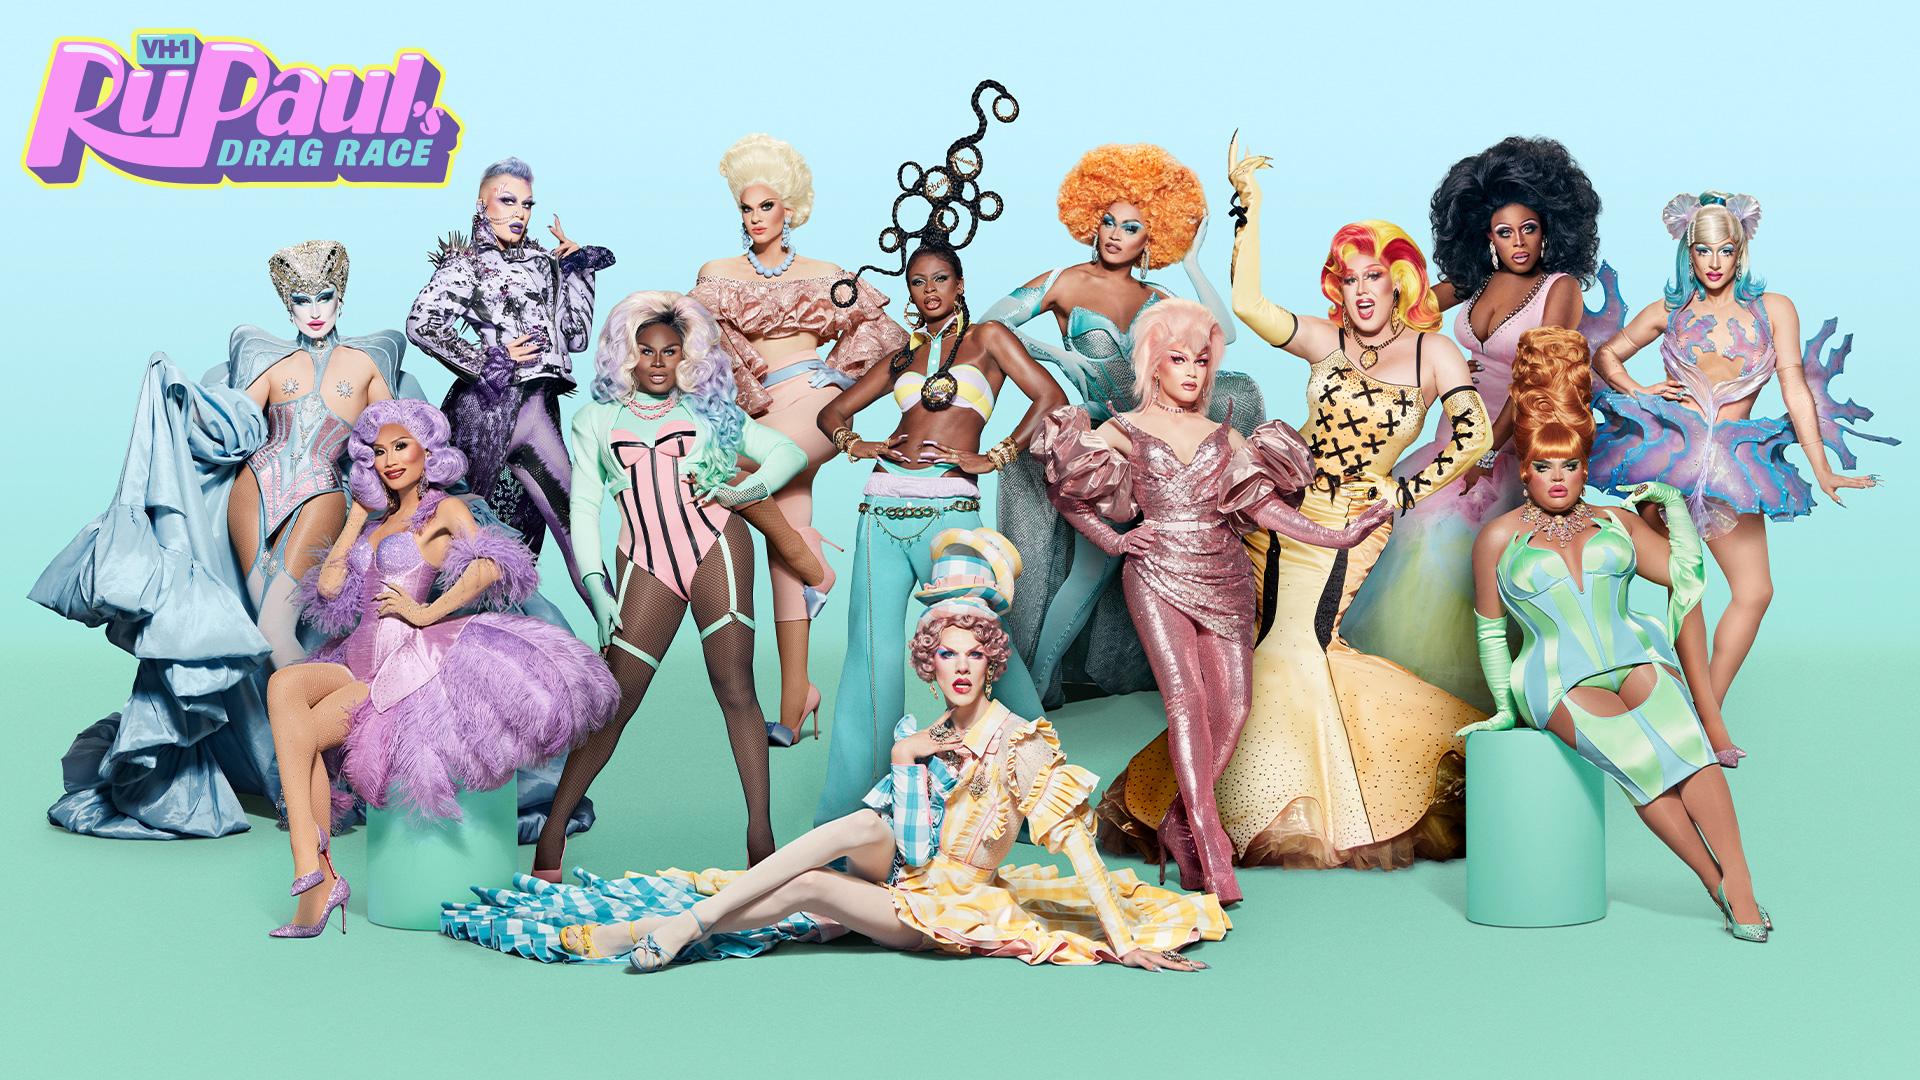 RuPaul's Drag Race' Season 13 Cast, Premiere Date Announced - Variety